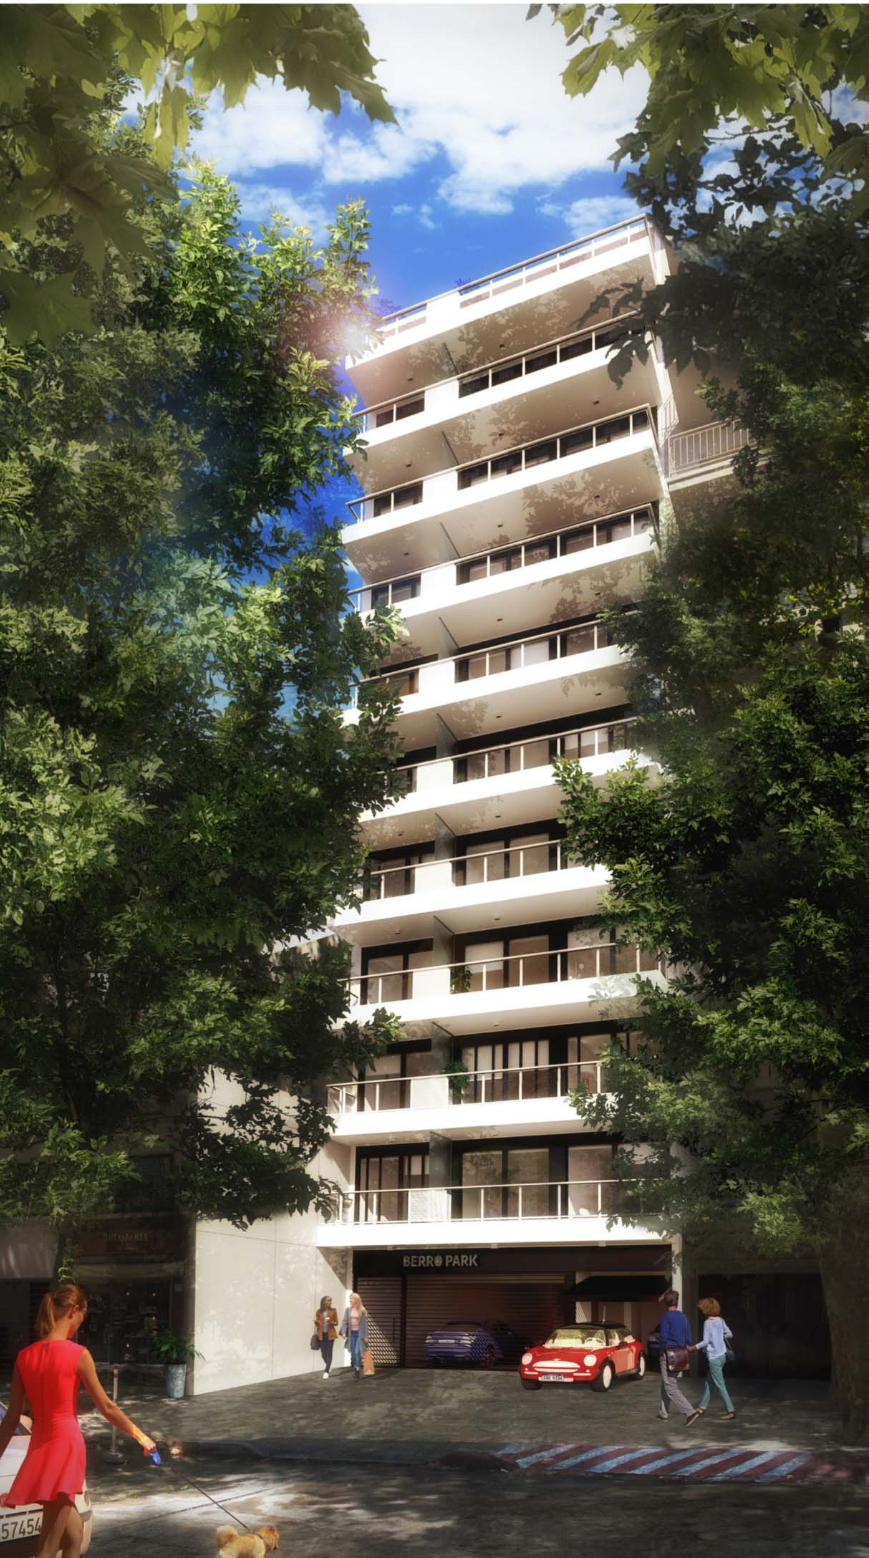 Un Dormitorio A Estrenar 2020 - Villa Biarritz